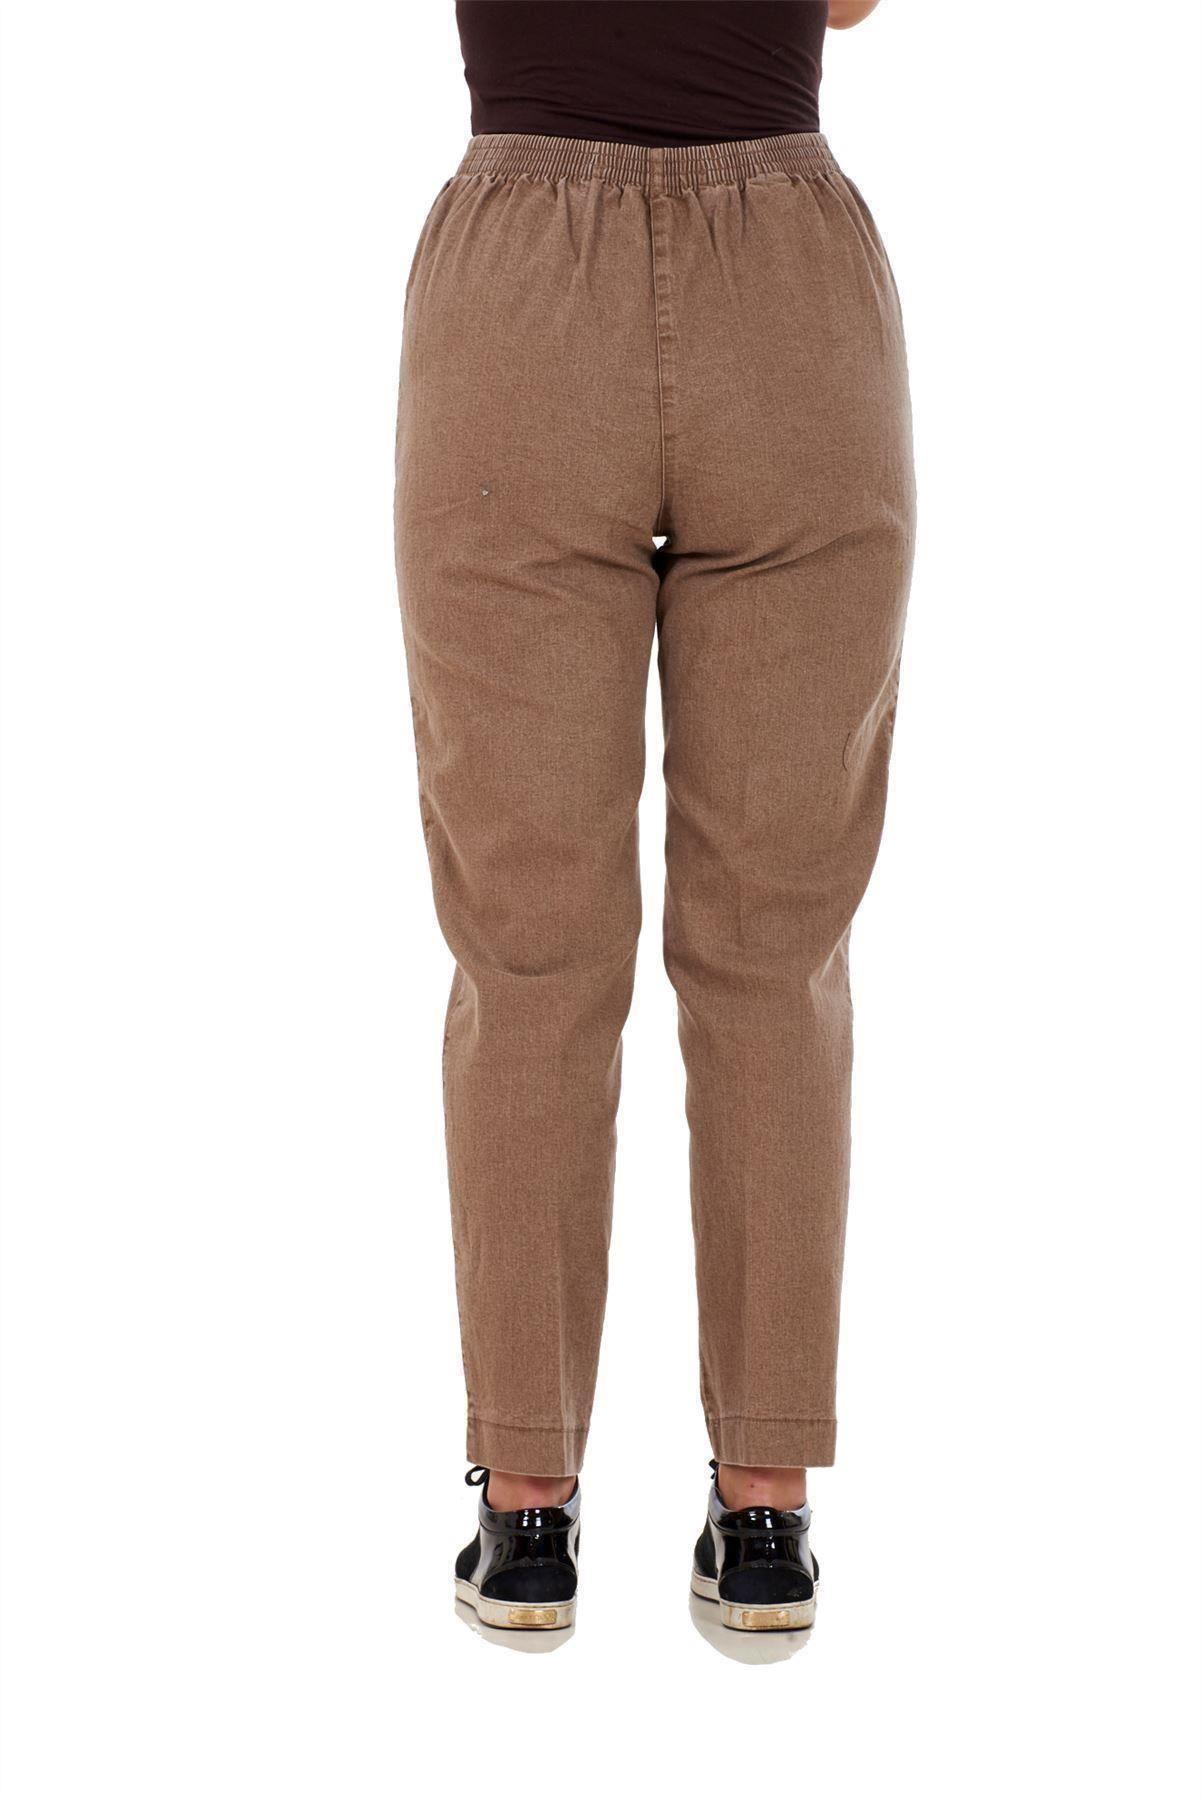 Ladies-Women-Trousers-Rayon-Cotton-Pockets-Elasticated-Stretch-Black-pants-8-24 thumbnail 4